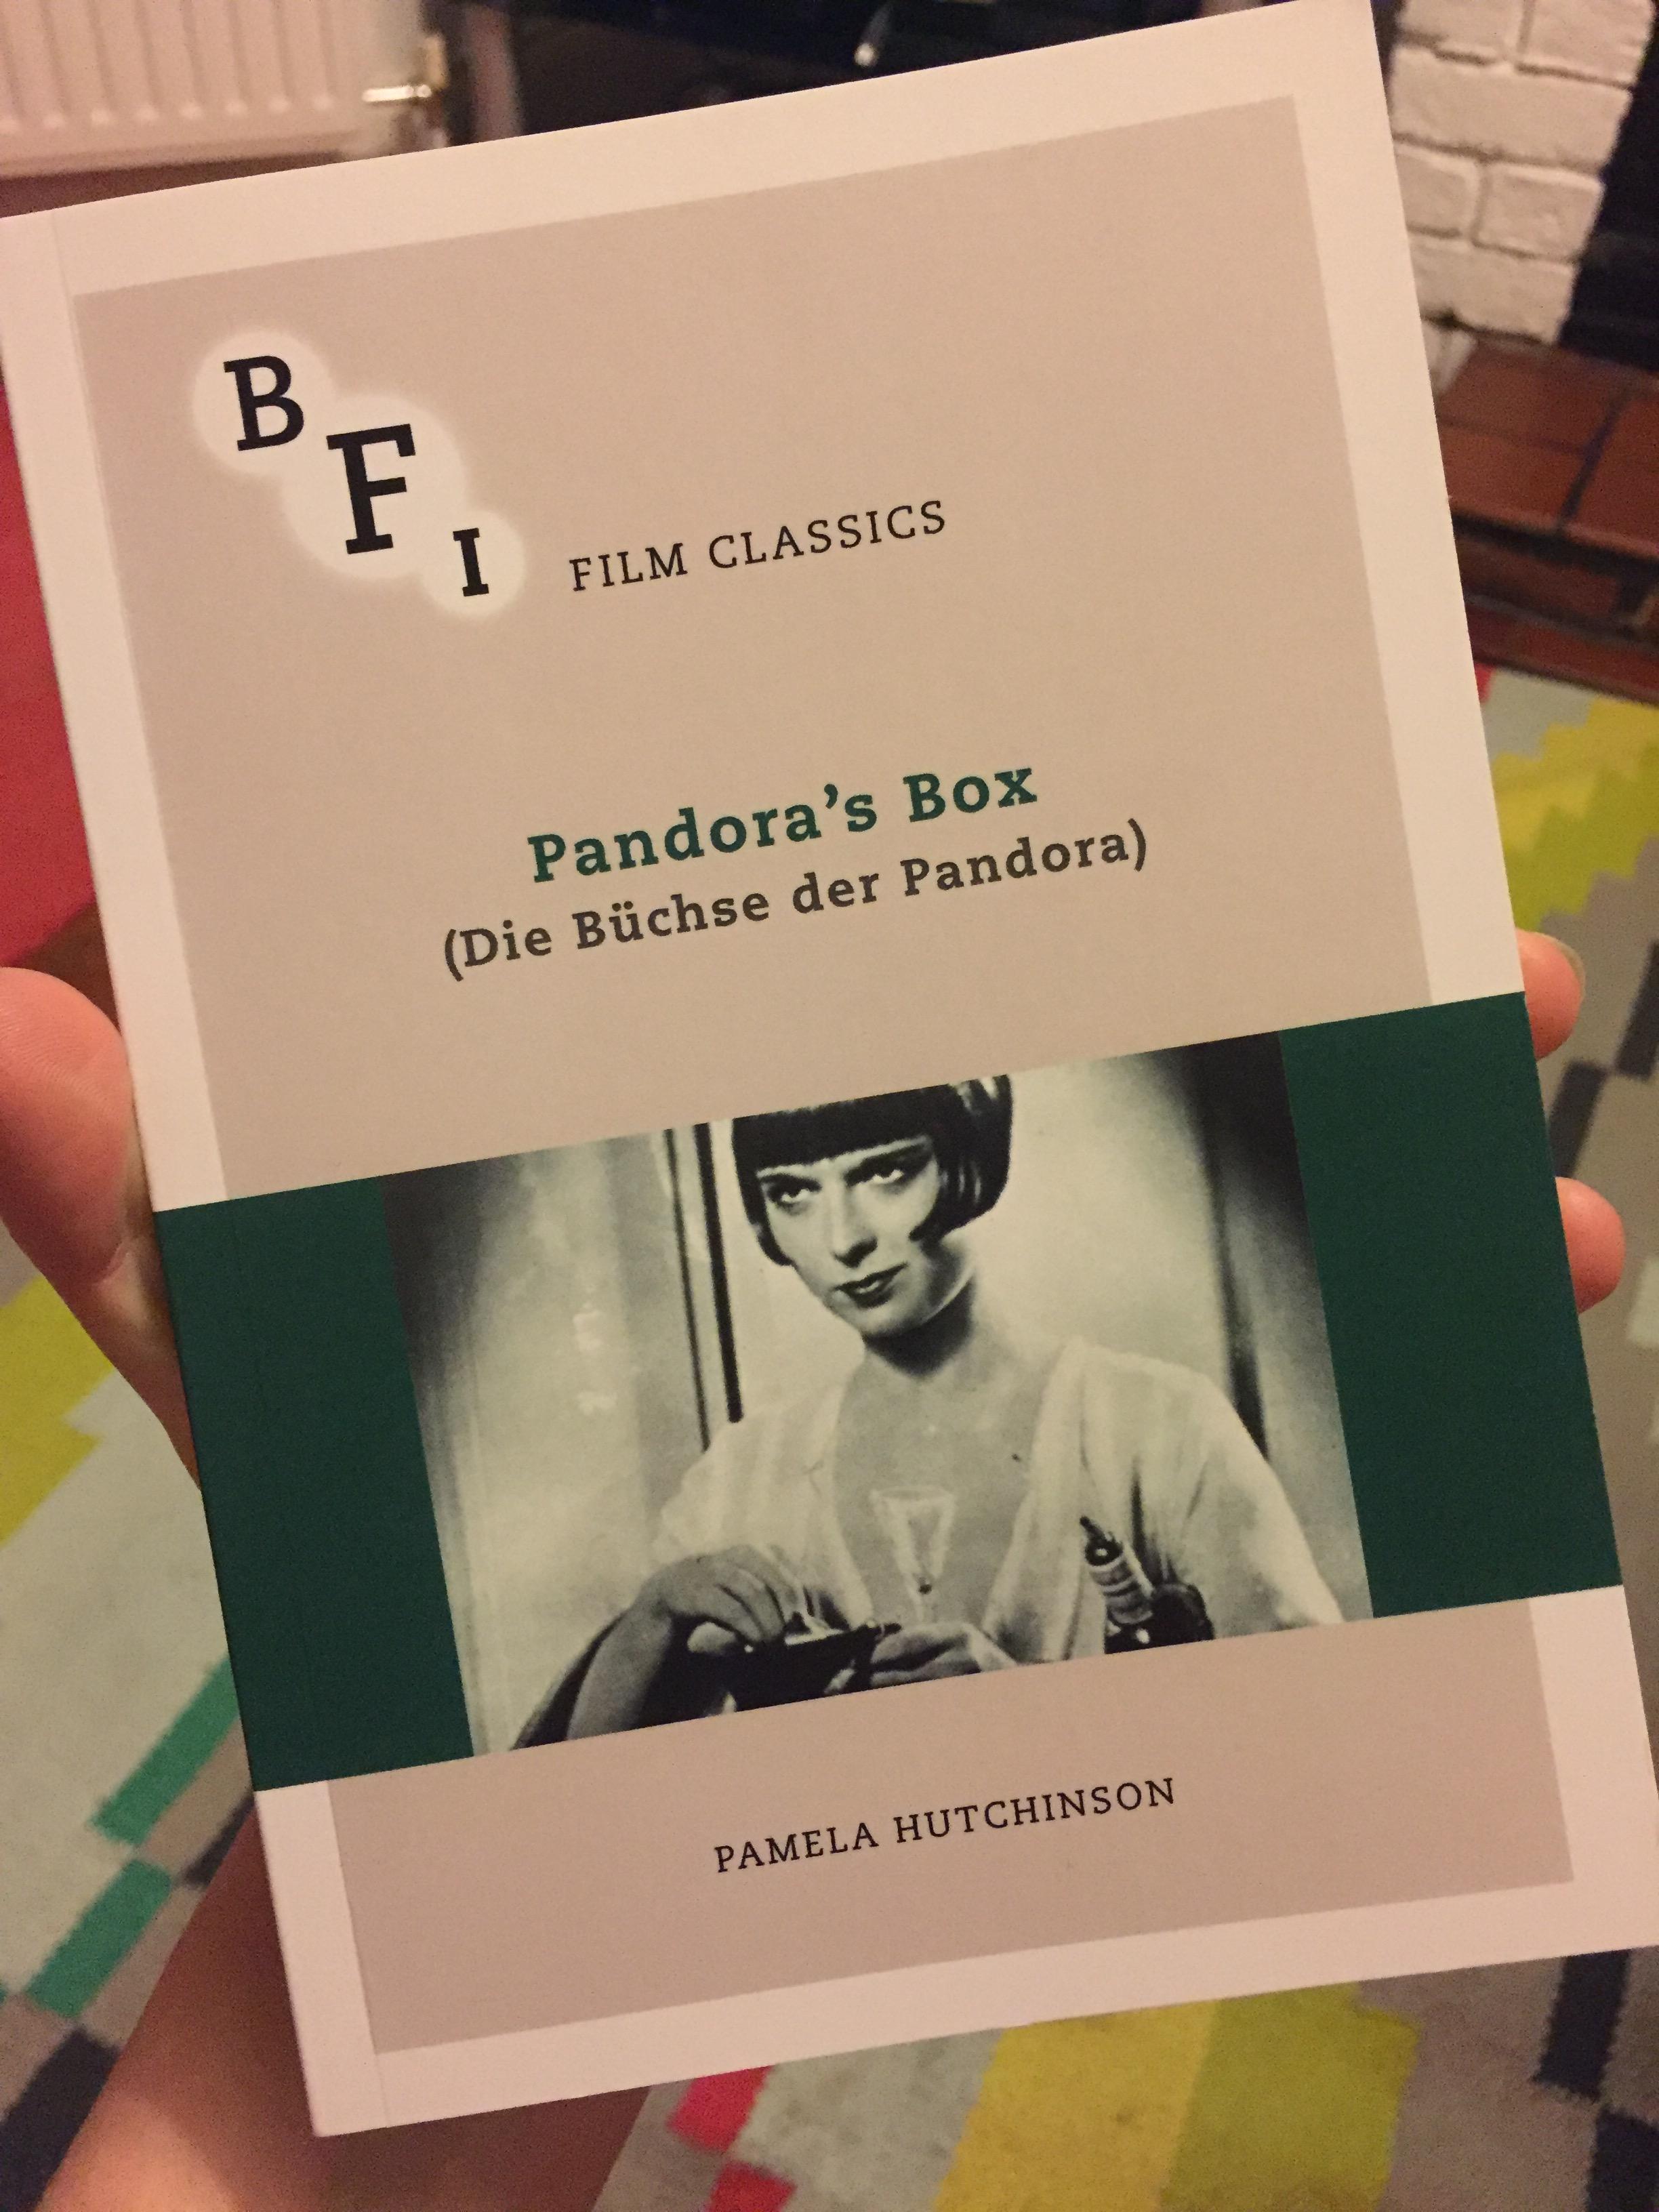 Pandora's Box by Pamela Hutchinson